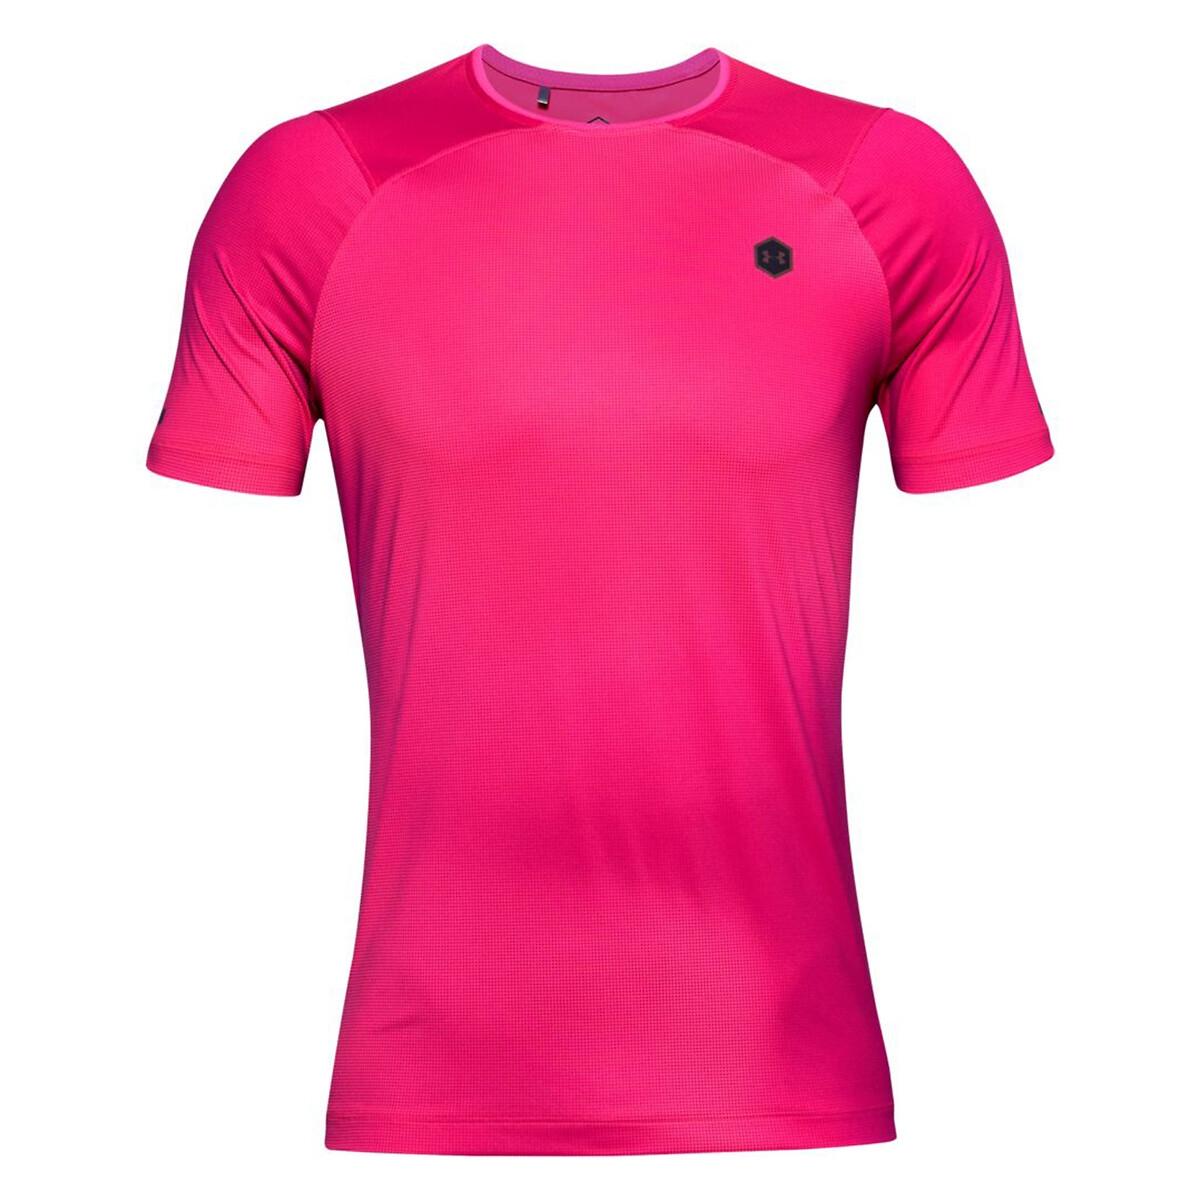 Футболка La Redoute Для тренировок Rush Fitted L розовый